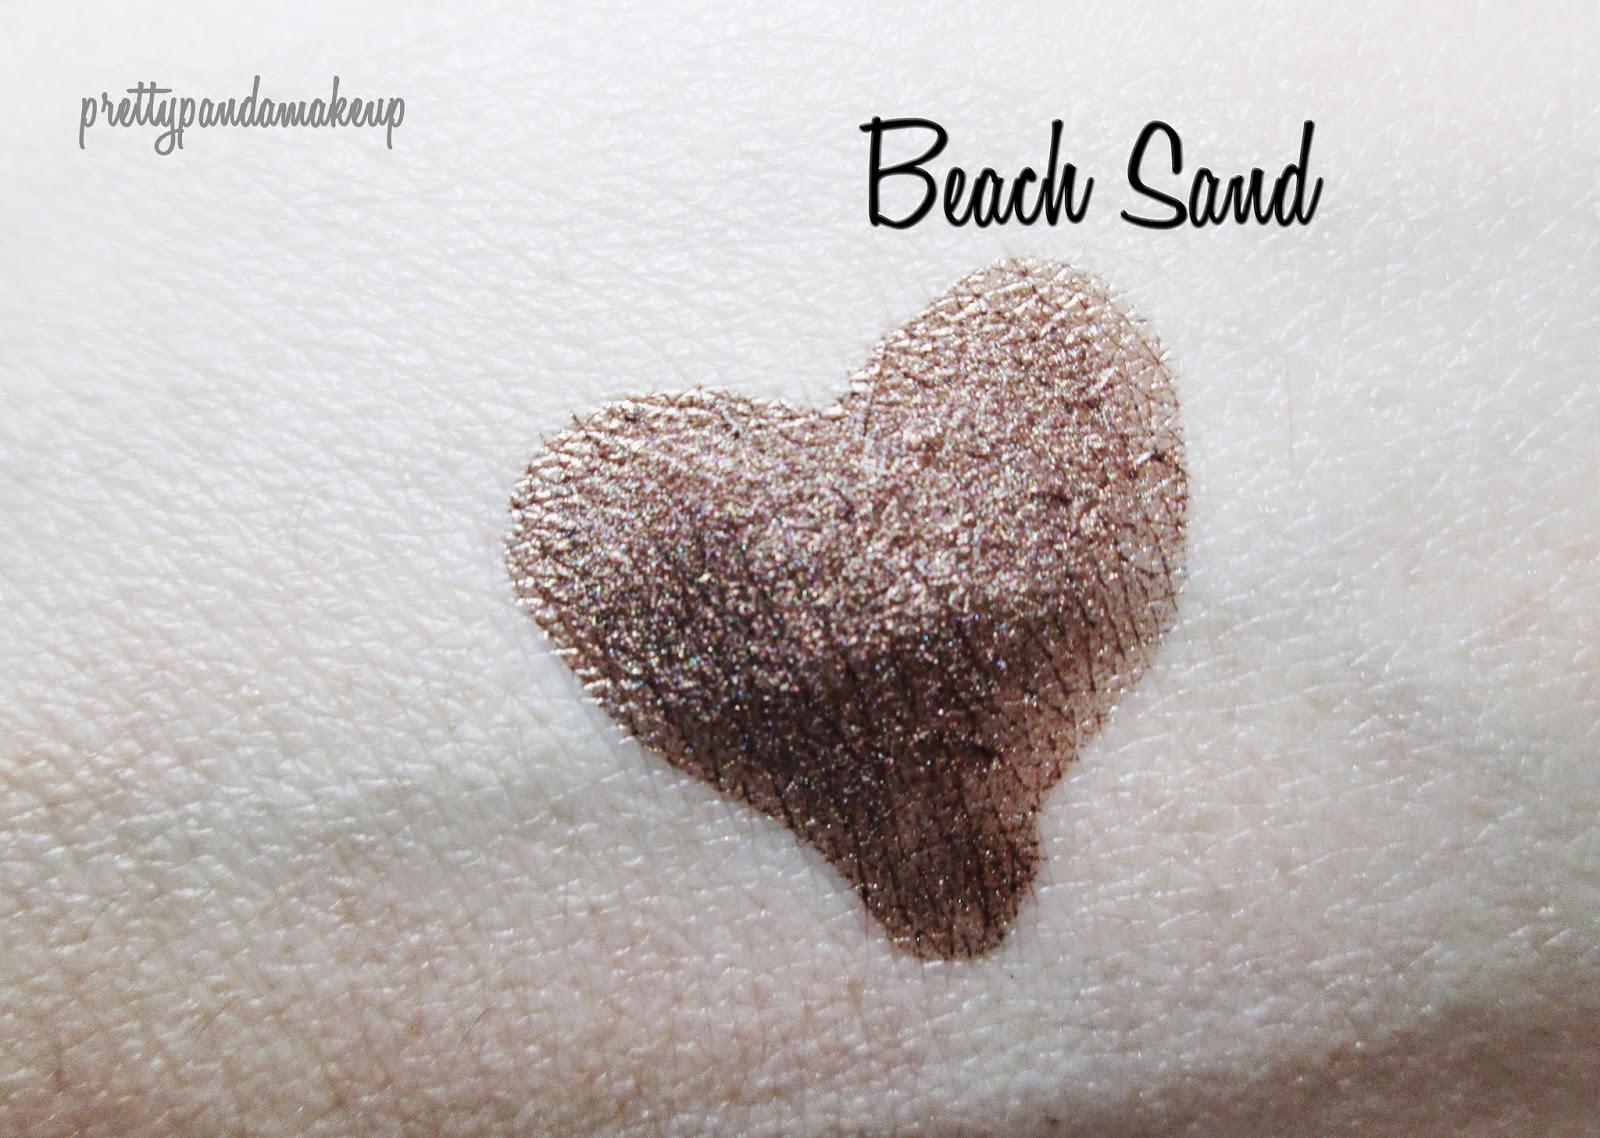 Josie Maran Coconut Watercolor eyeshadow in Beach Sand